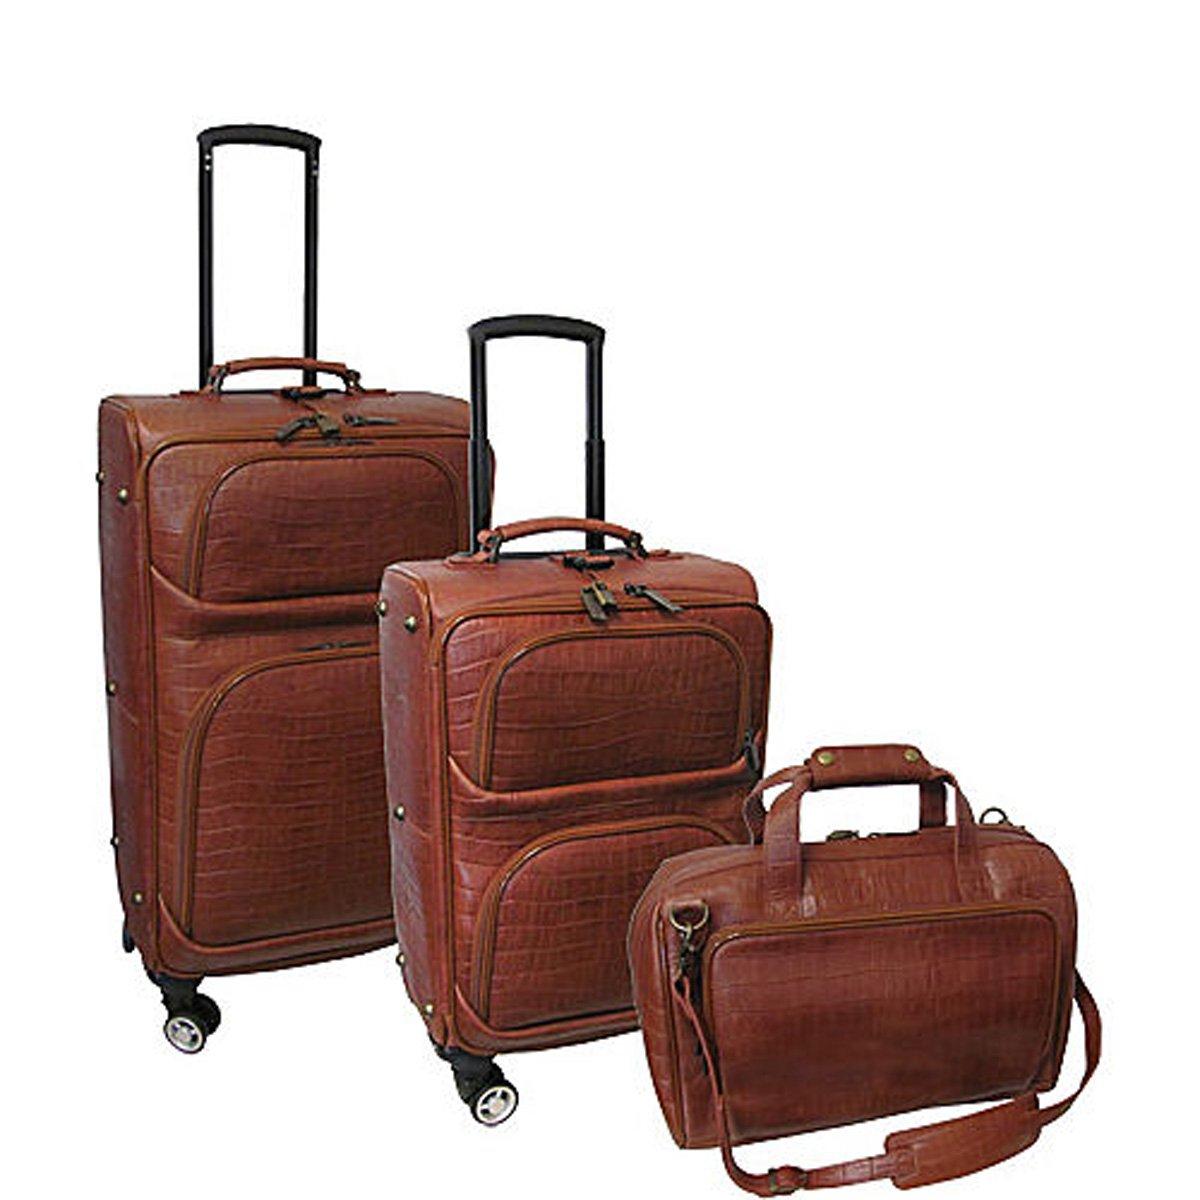 The Set of Classic Brown AmeriLeather Traveler Croco Print 3 Piece Luggage Set